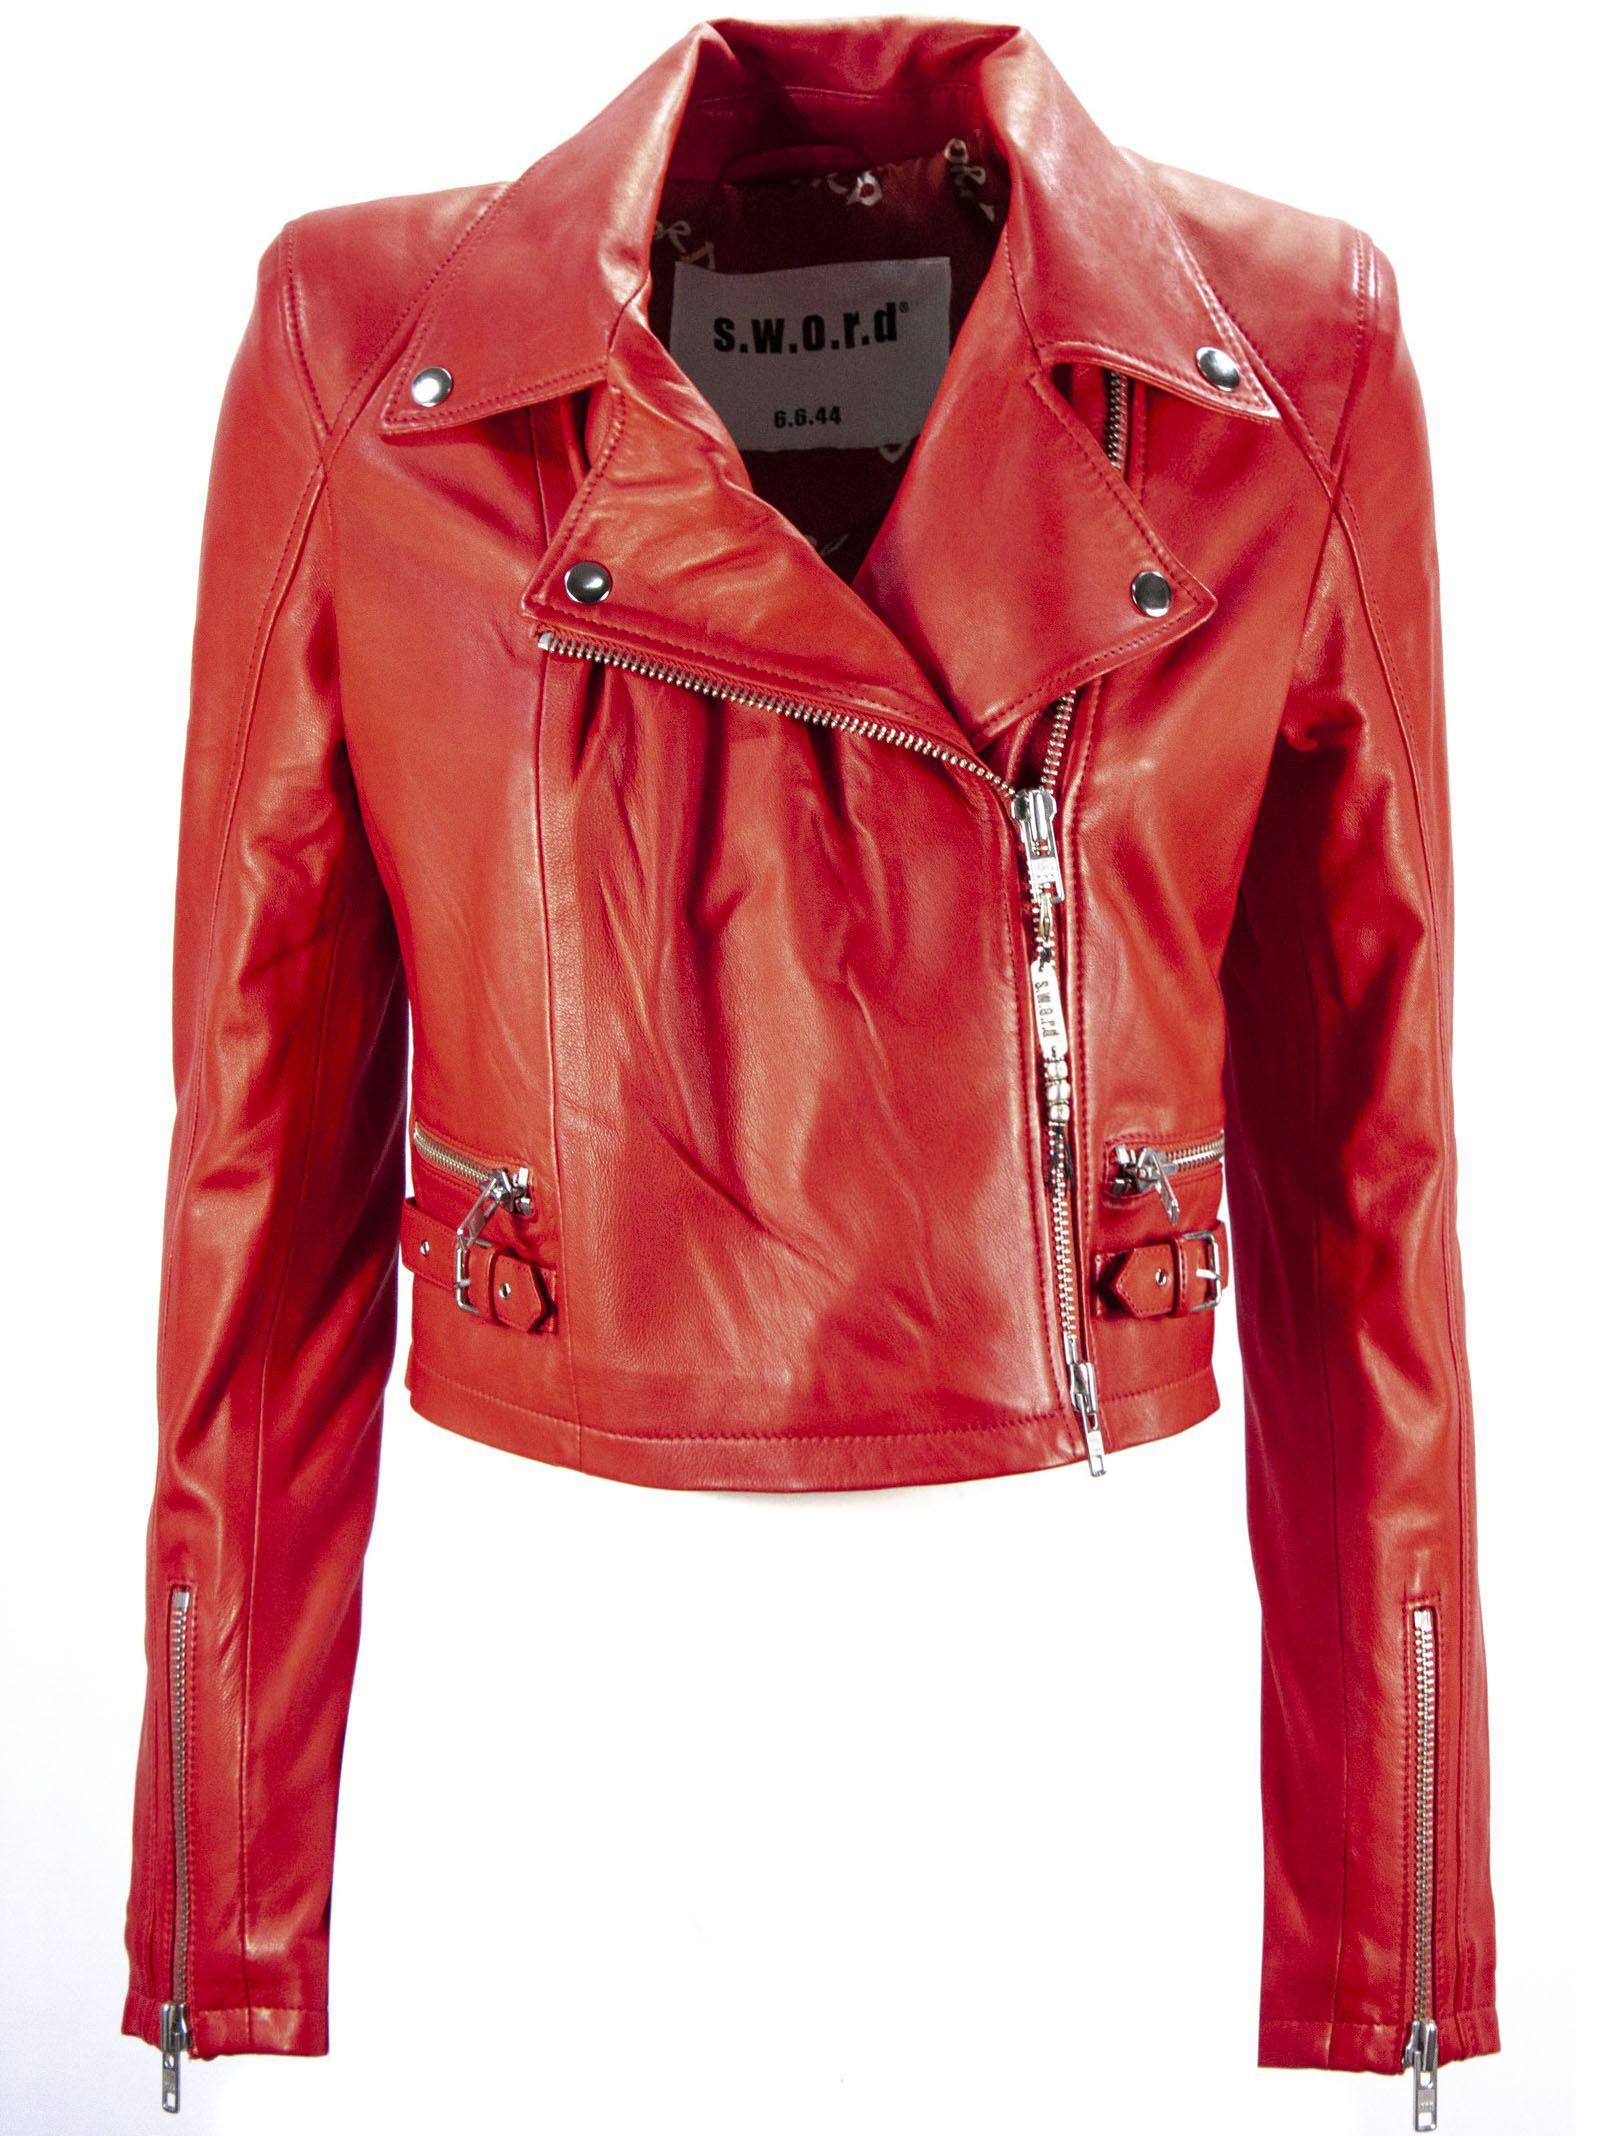 S.W.O.R.D 6.6.44 Red Leather Biker Jacket